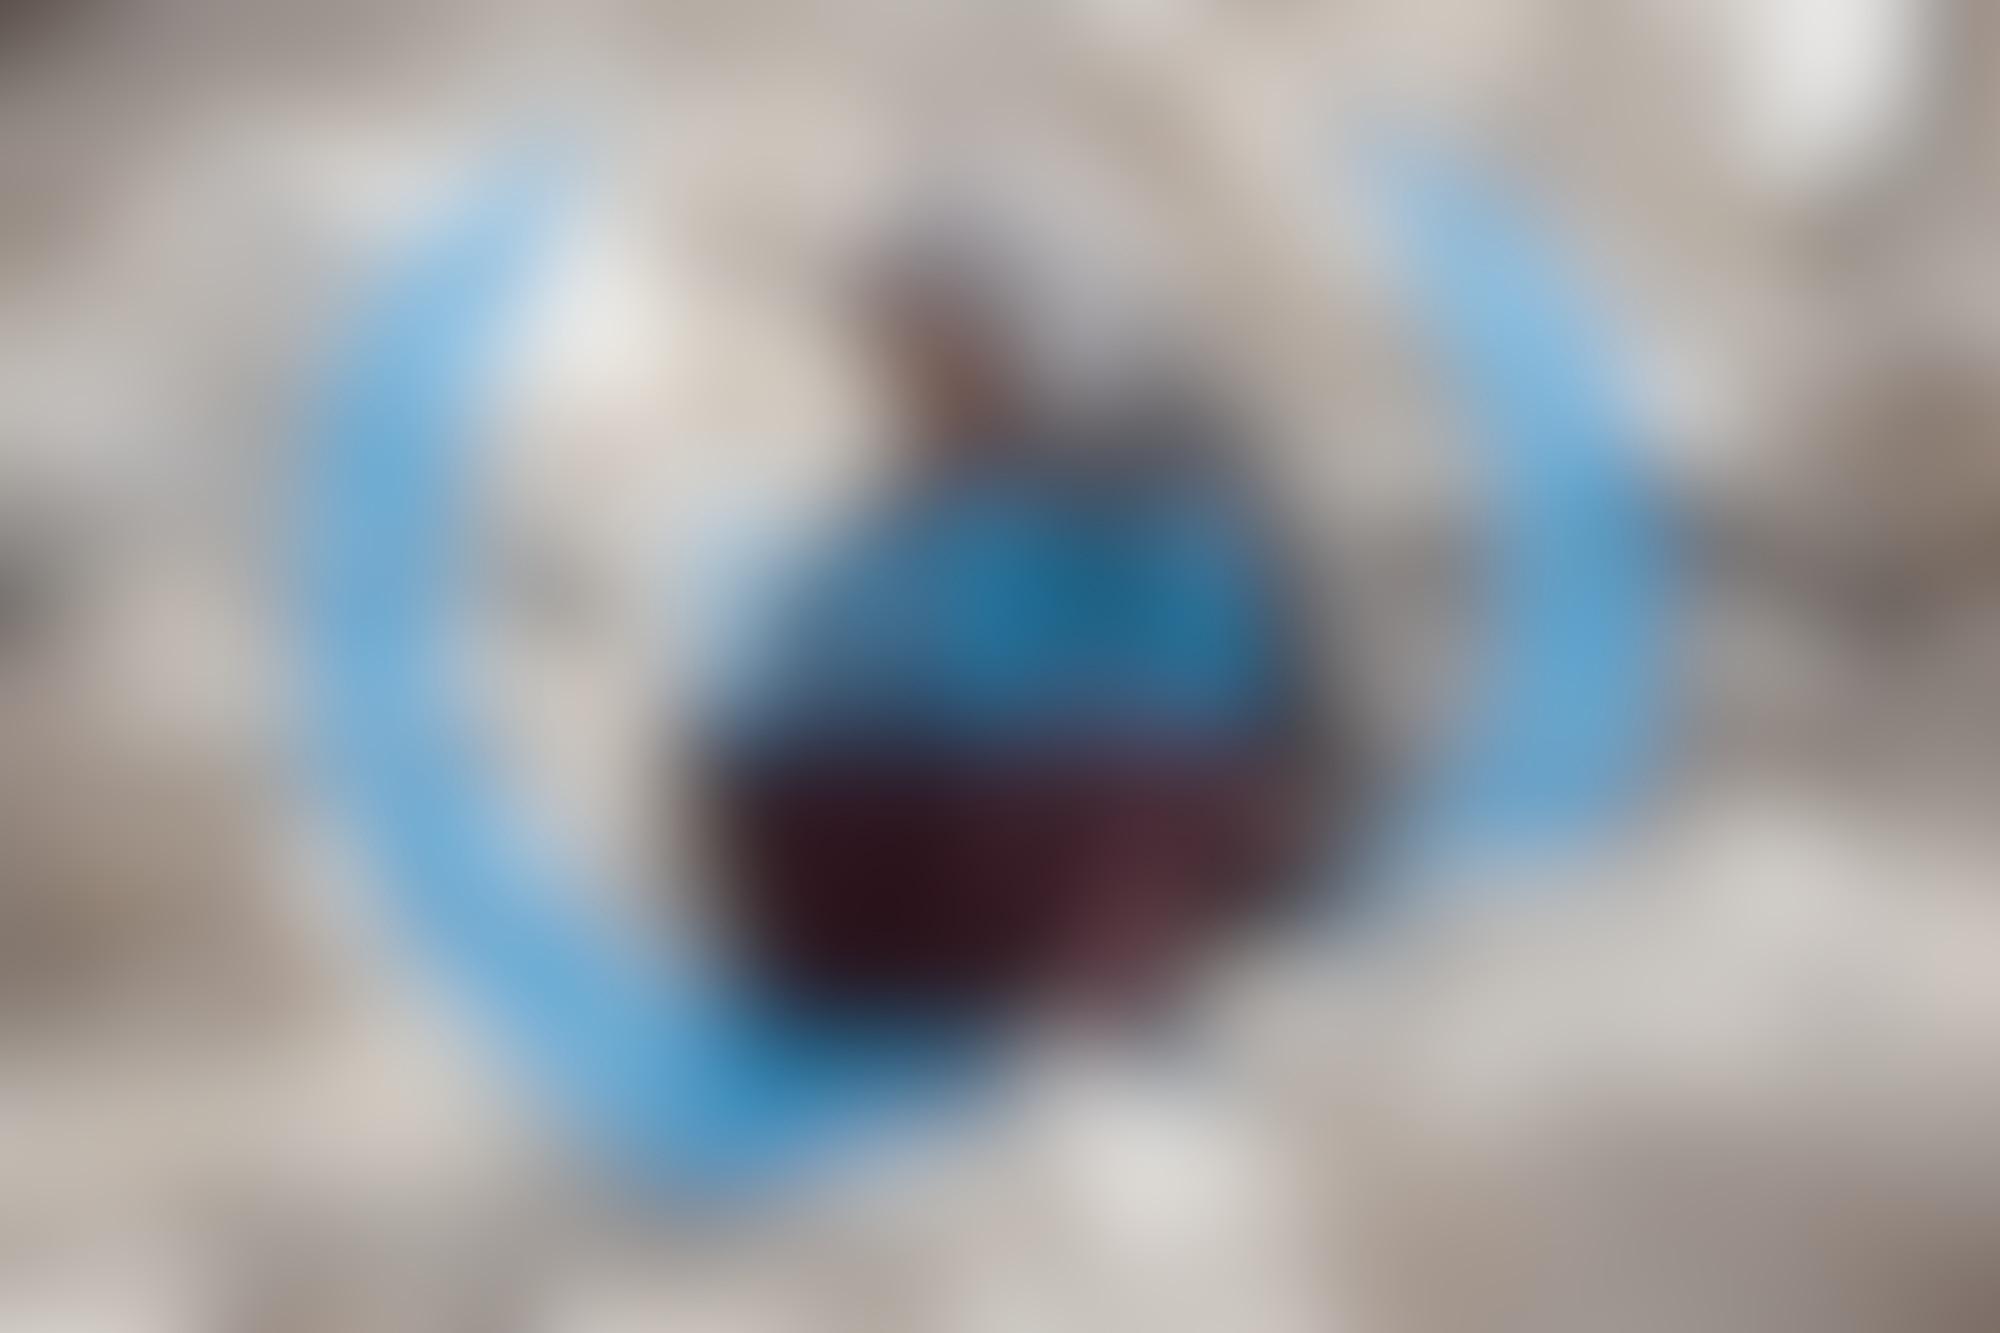 The United Nations Syria mission 2015 C2 A9 TEMPLO autocompressfitresizeixlibphp 1 1 0max h2000max w3 D2000q80s3e6bed3fc4c400a5e2d90257d846ef3e